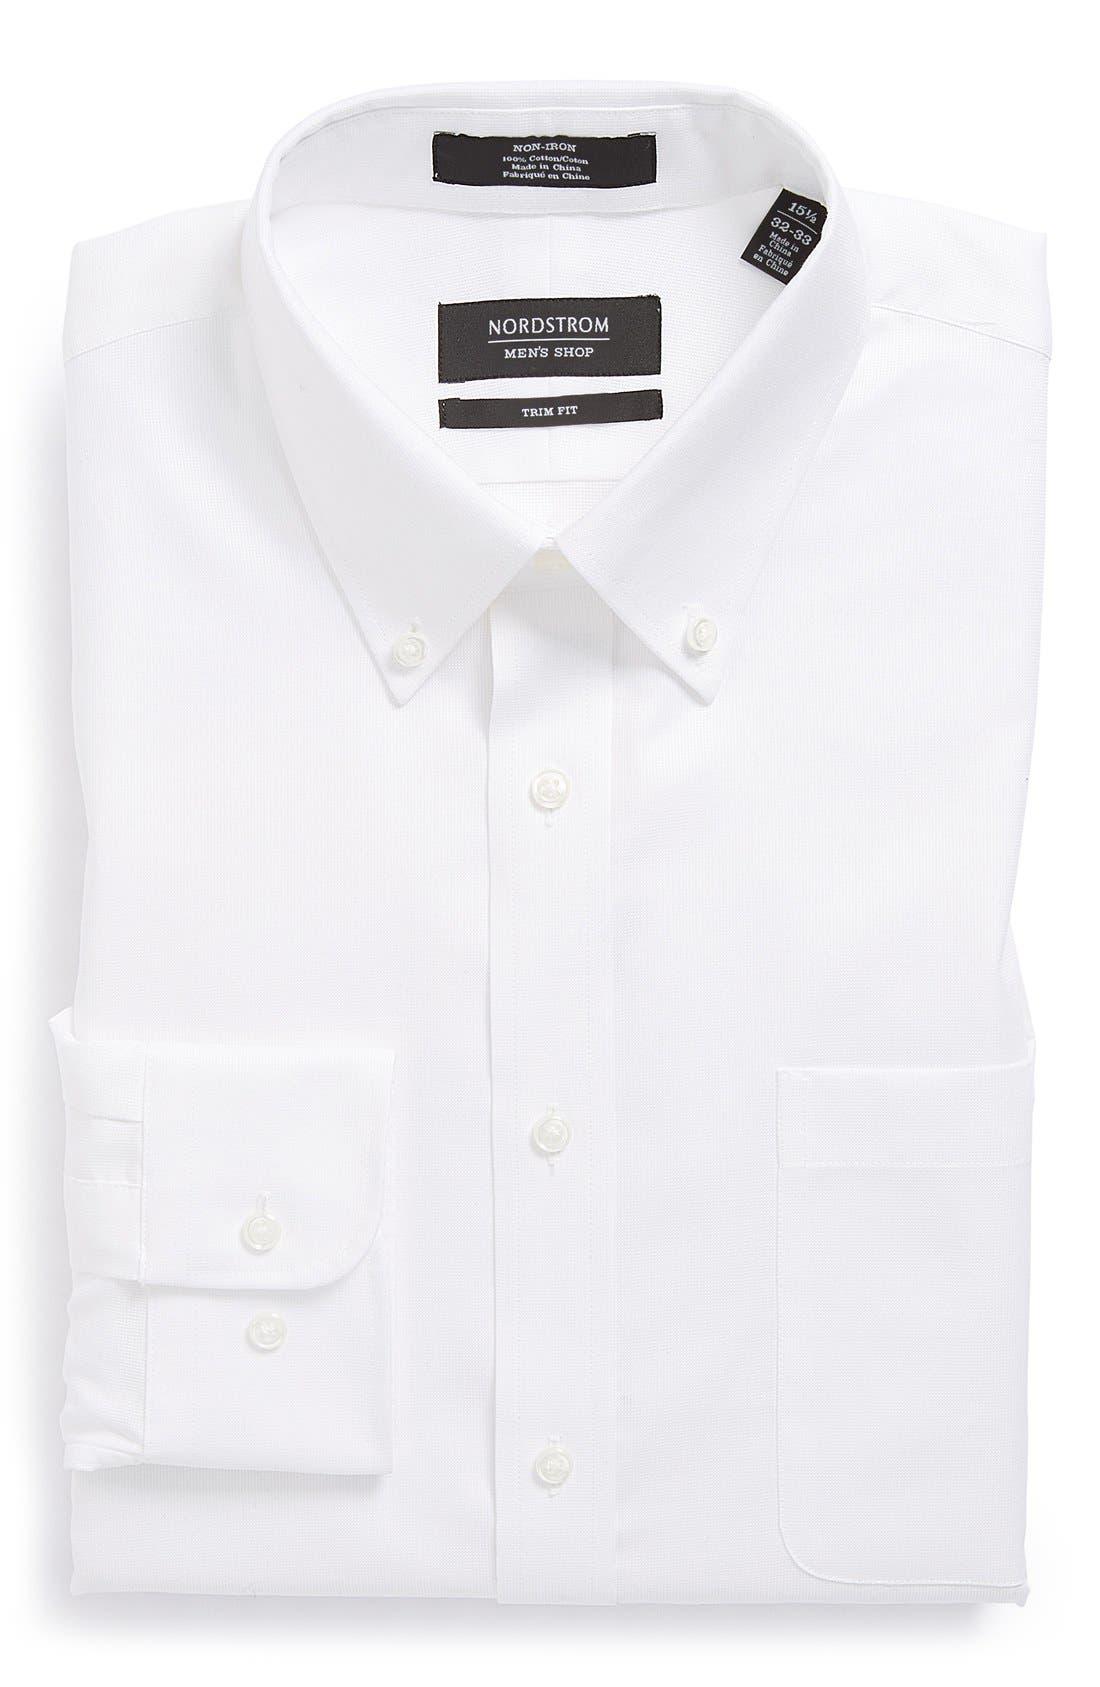 Nordstrom Trim Fit Non-Iron Dress Shirt,                             Main thumbnail 1, color,                             100